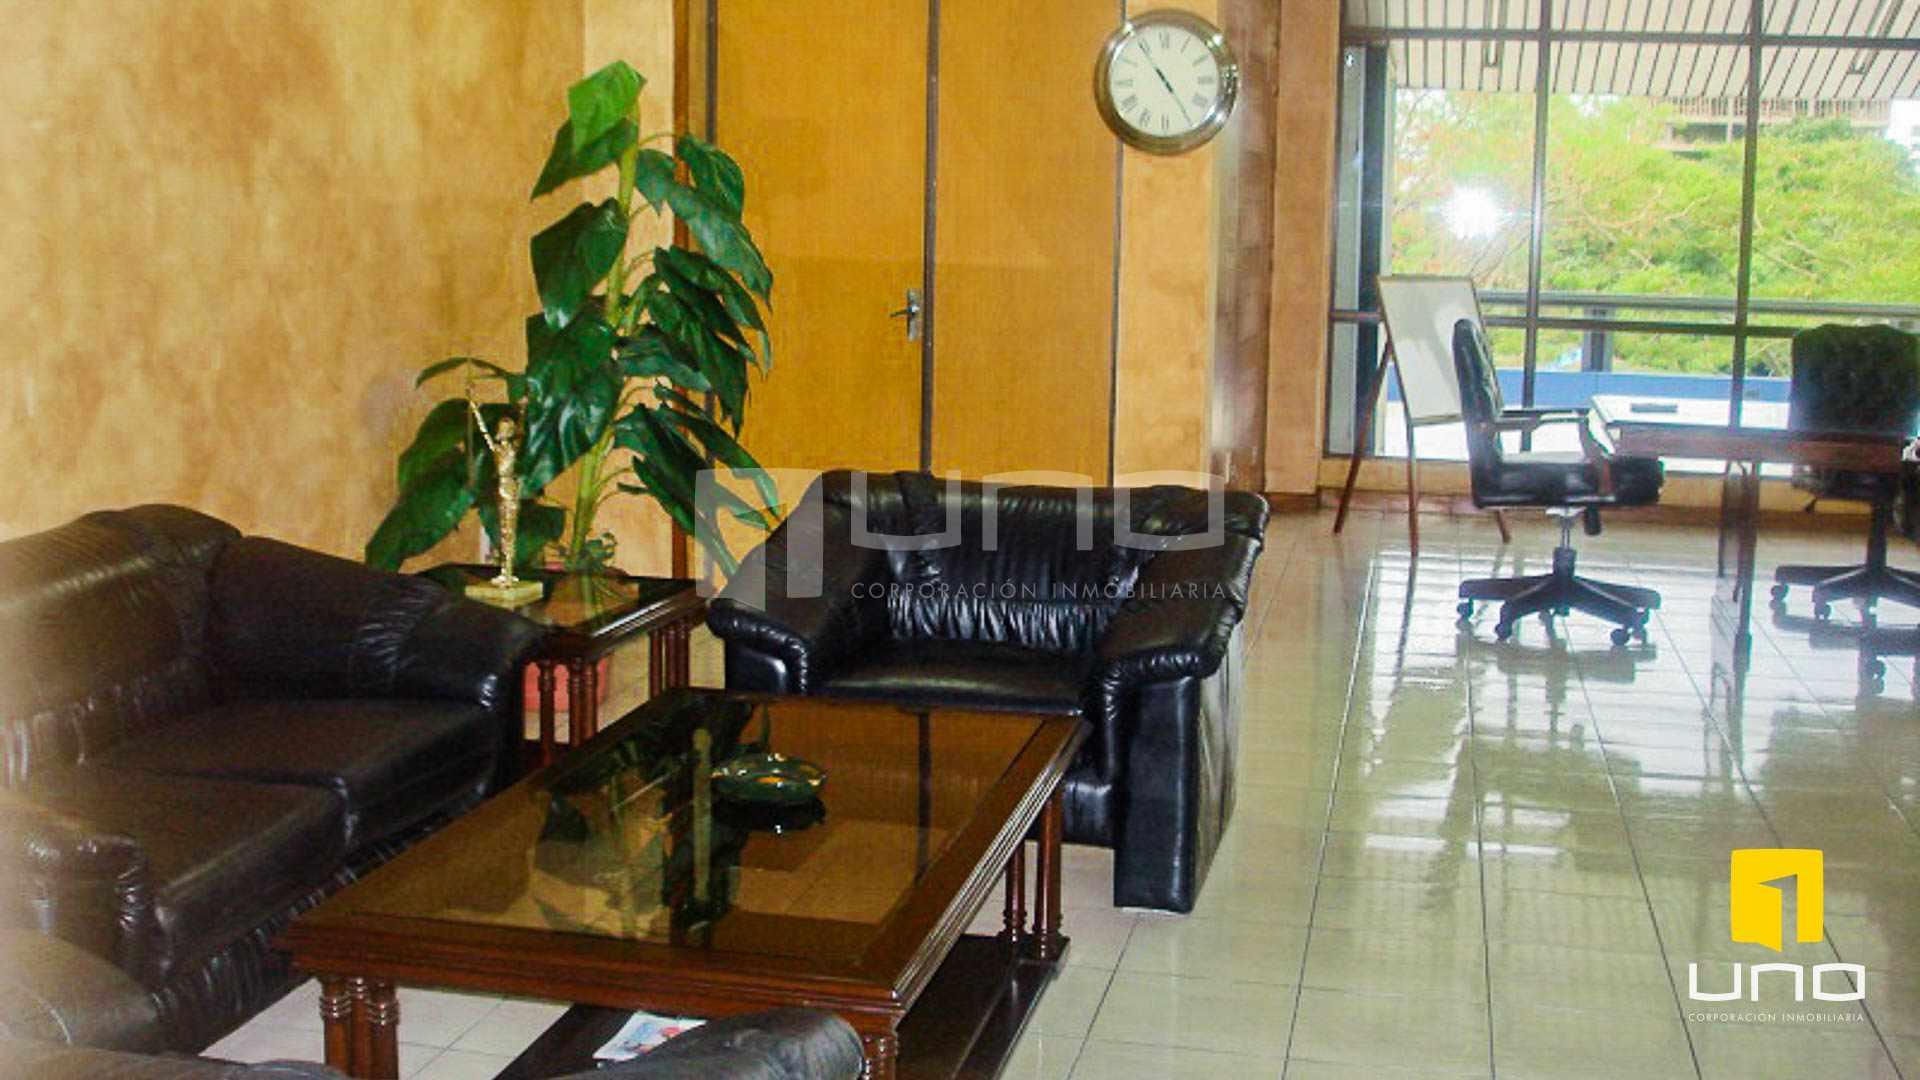 Oficina en Venta REGALO OFICINA SOBRE AV. IRALA EN PRIMER PISO Foto 4